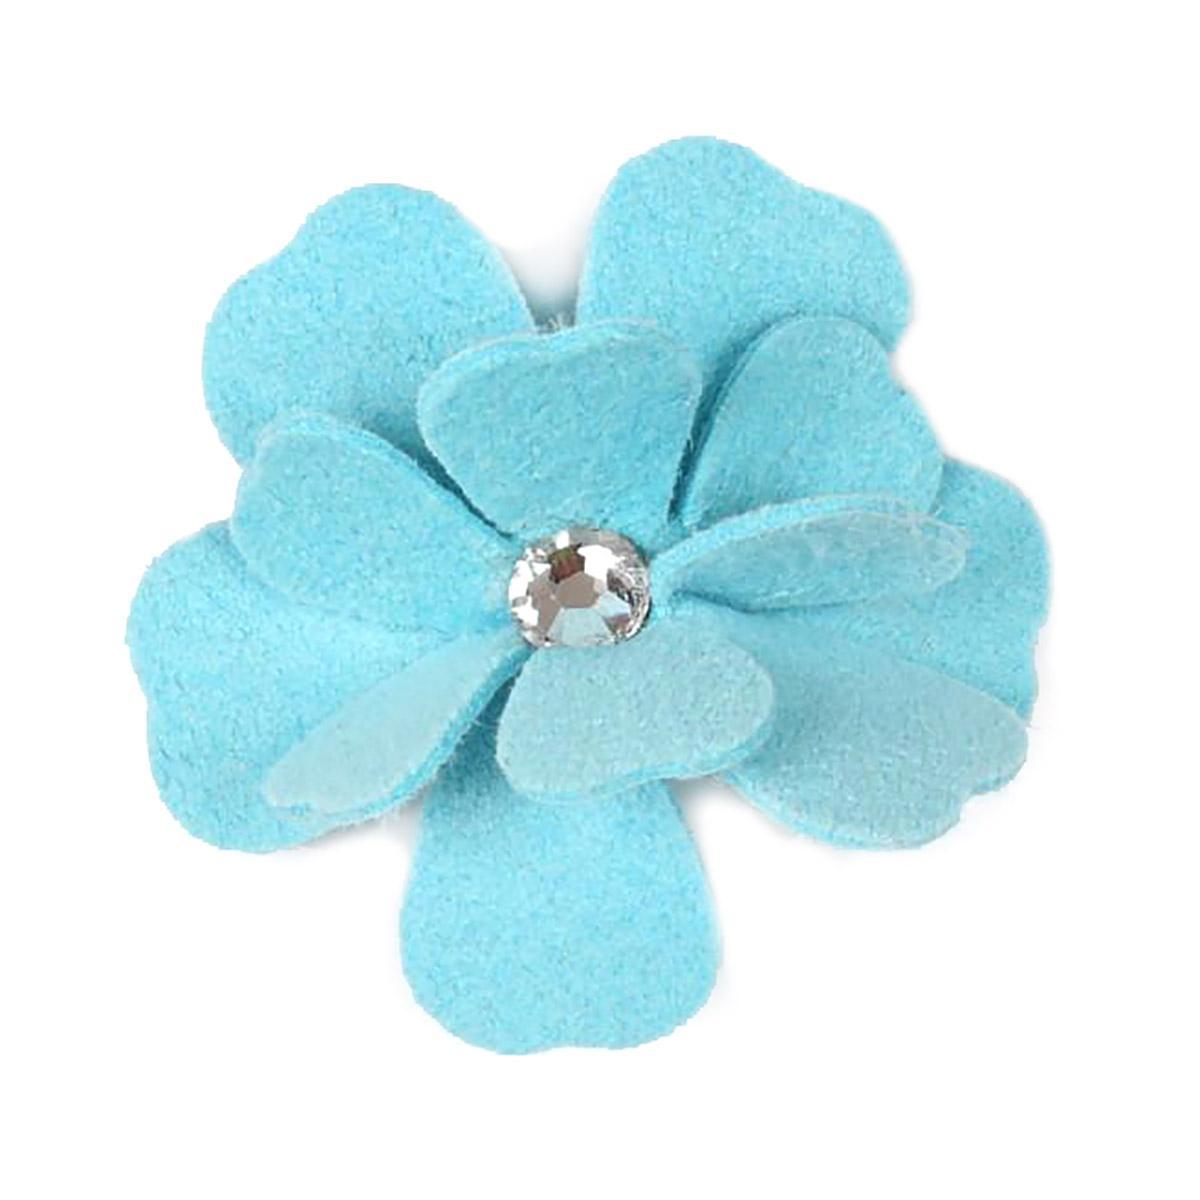 Tinkie's Garden Flower Dog Hair Bow by Susan Lanci - Tiffi Blue